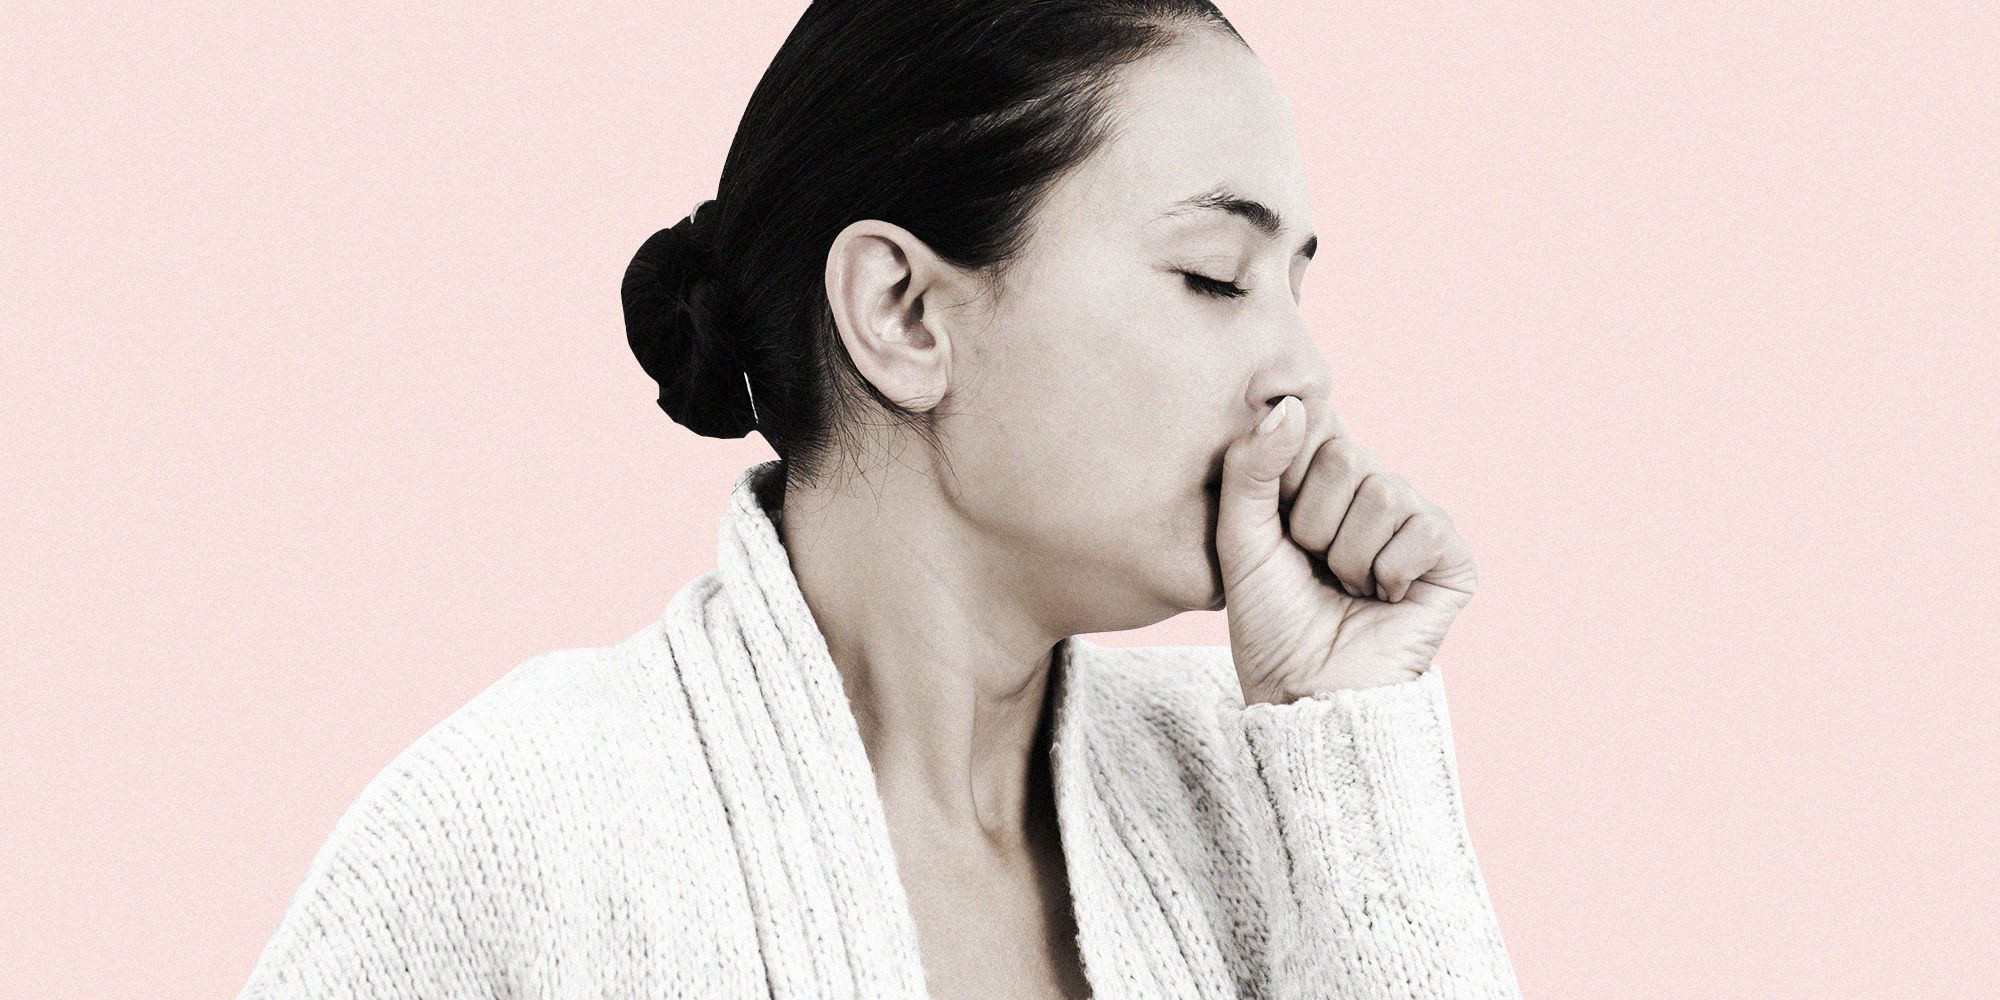 6 Symptoms Of Excessive Burping That Aren't Normal